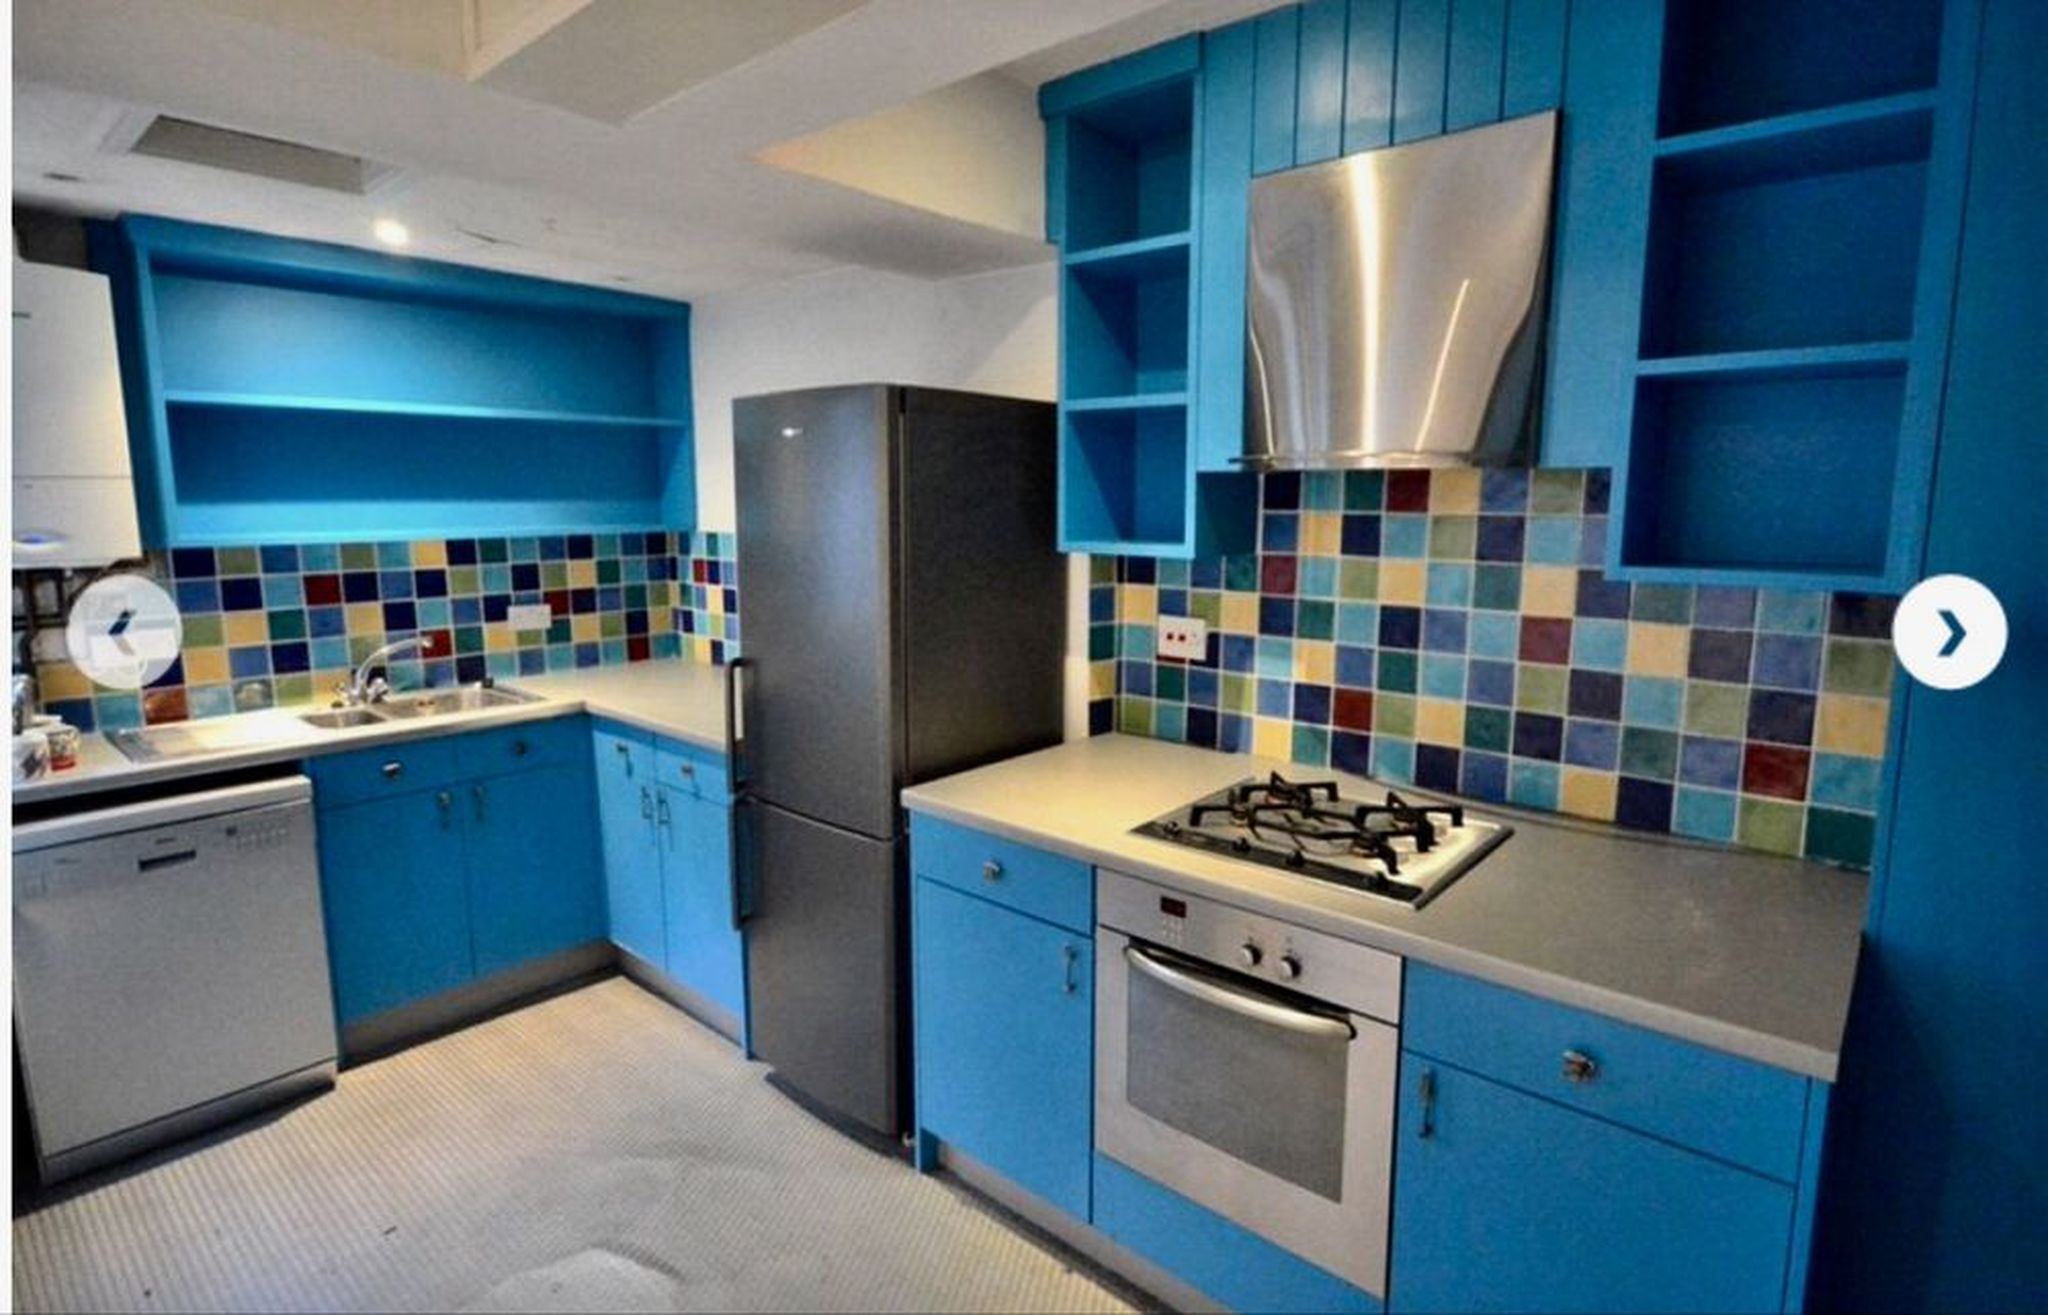 Wow factor kitchen diner upgrade built in music cupboard in grade 2 ...